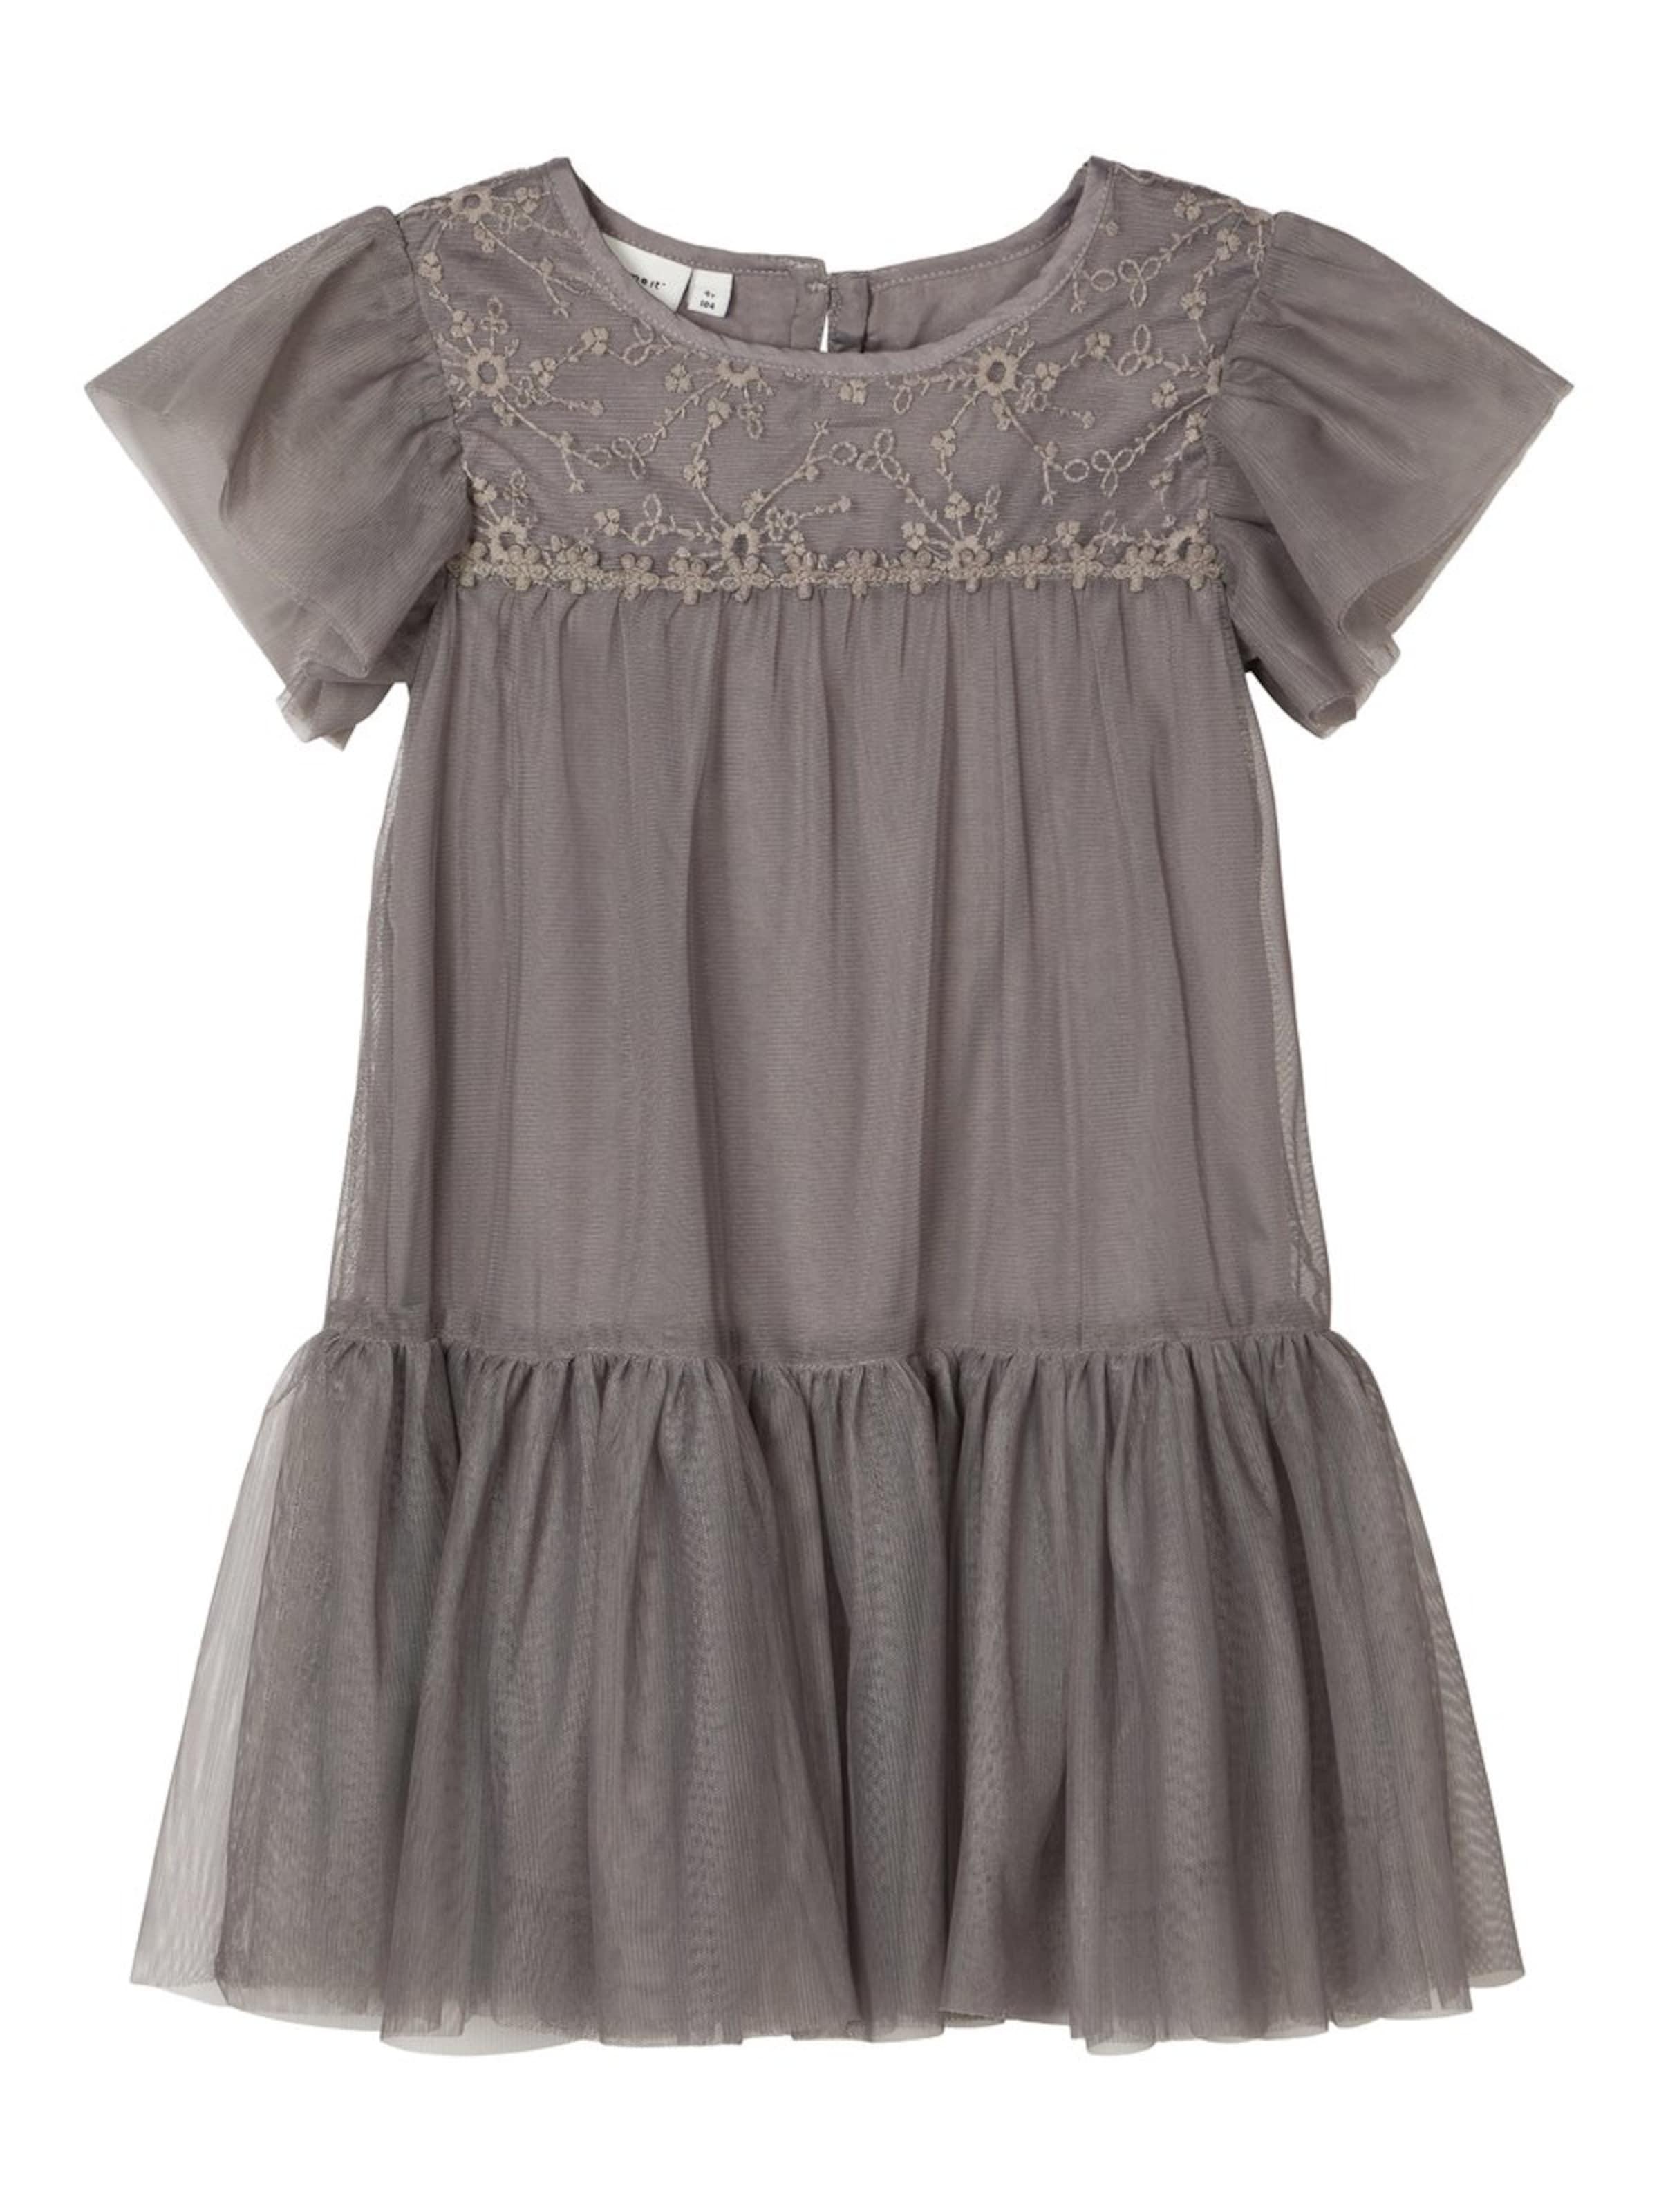 Kinder,  Mädchen,  Kinder NAME IT Kleid rot, weiß | 05714492115351